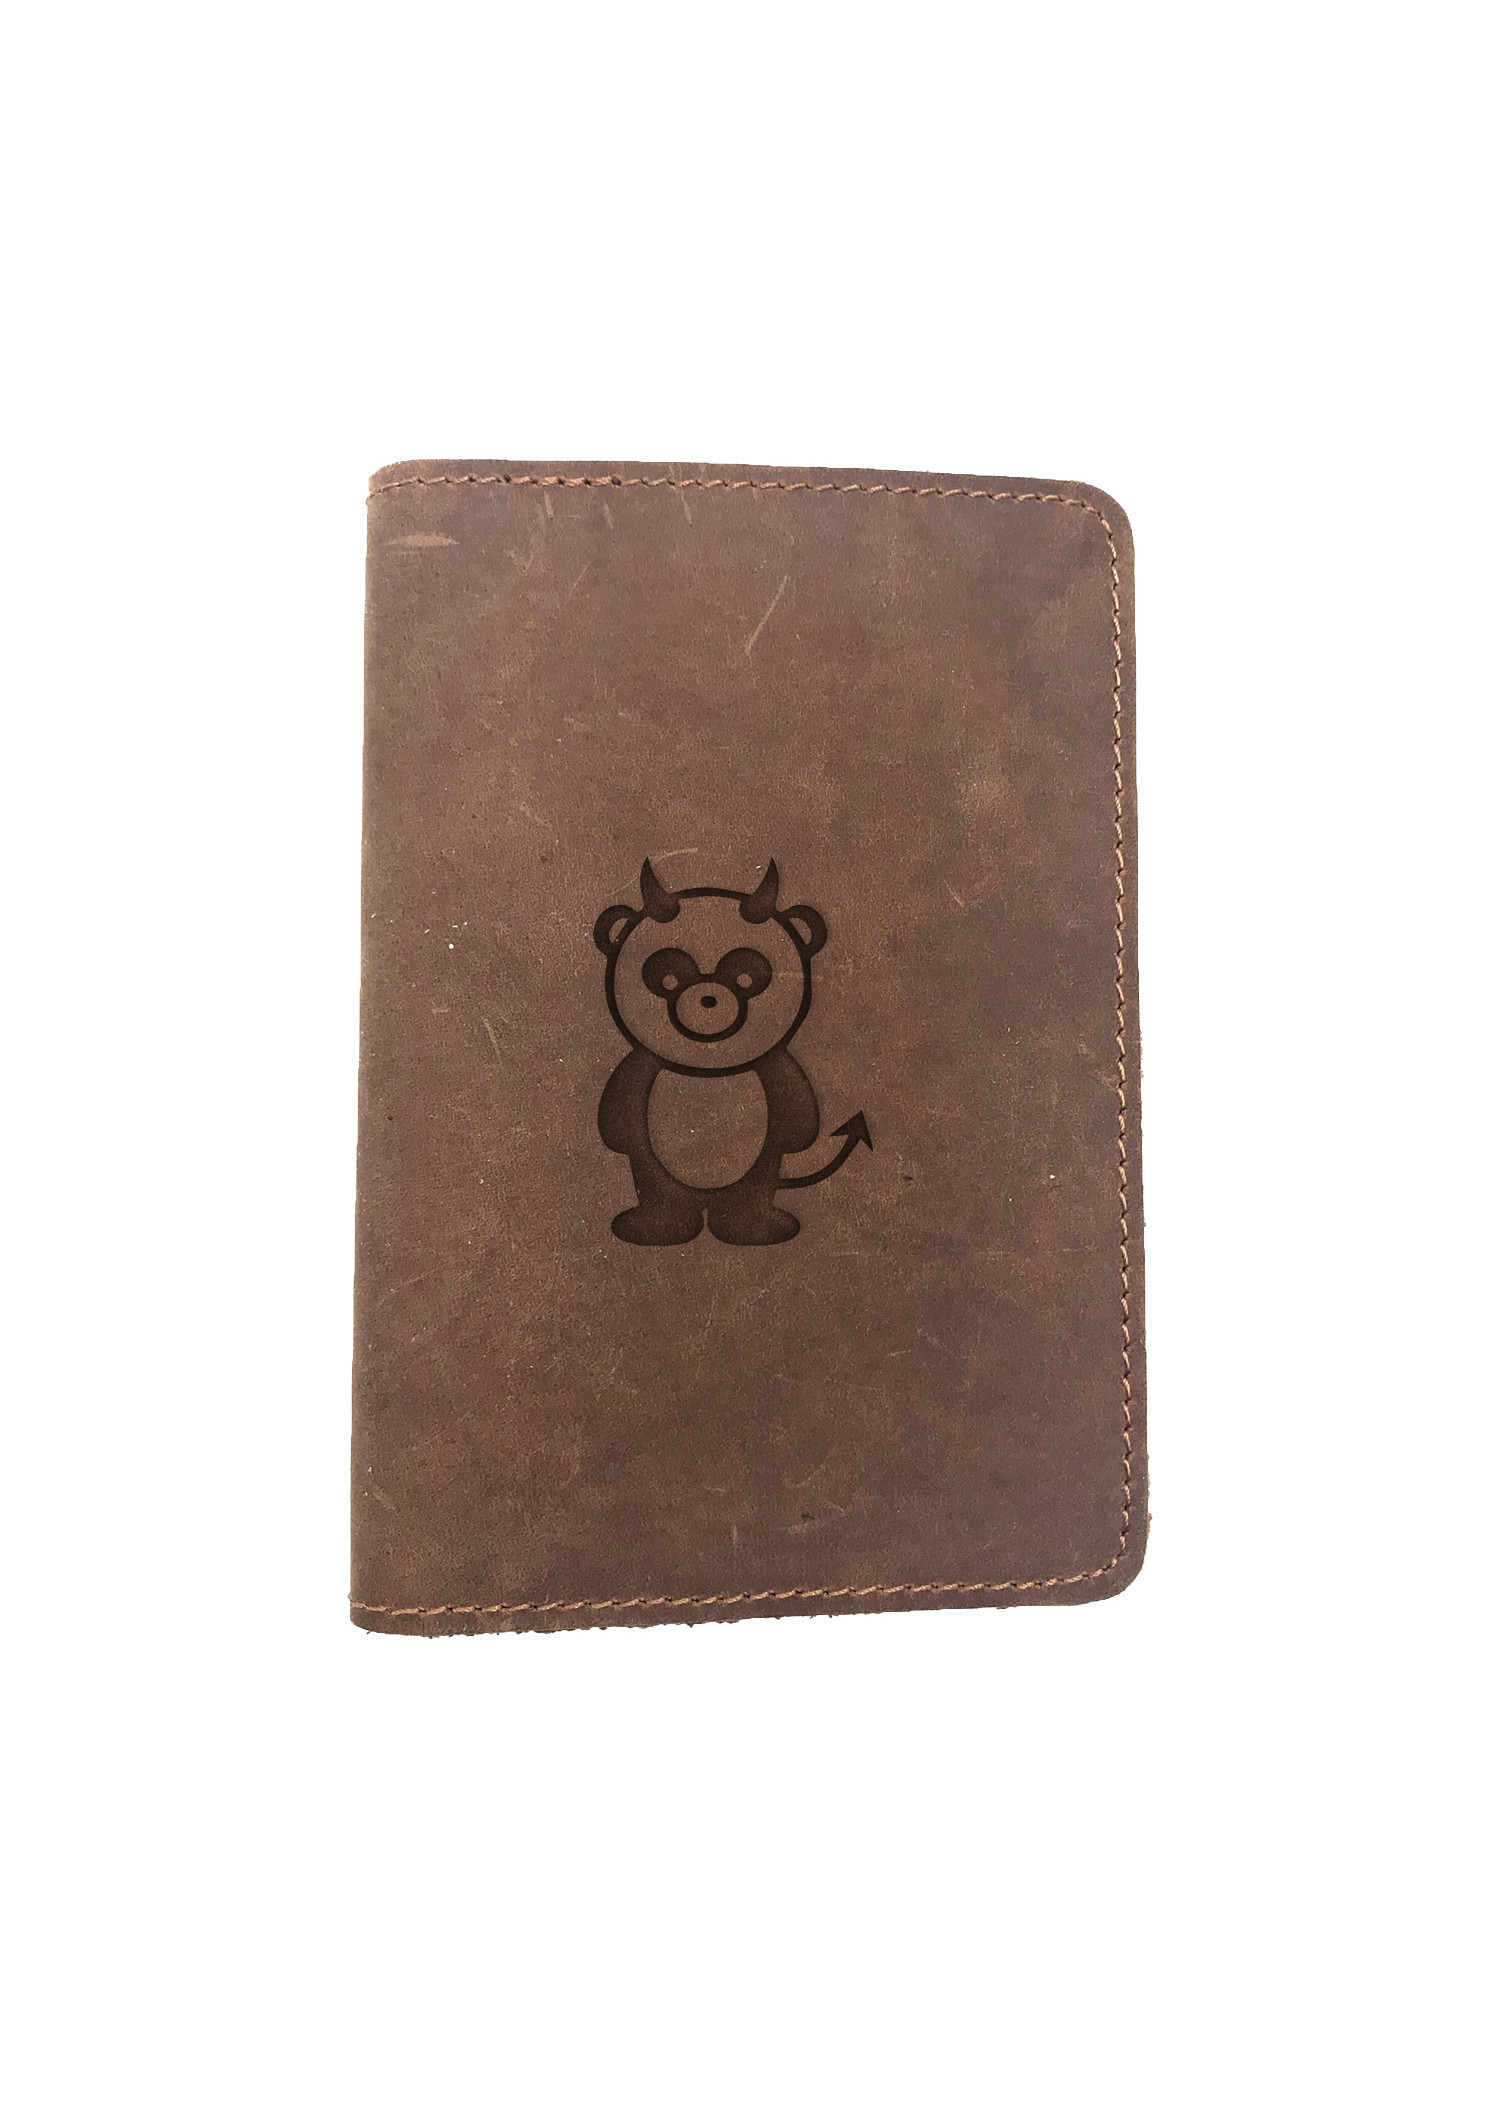 Passport Cover Bao Da Hộ Chiếu Da Sáp Khắc Hình Gấu trúc DEVIL PANDA (BROWN)